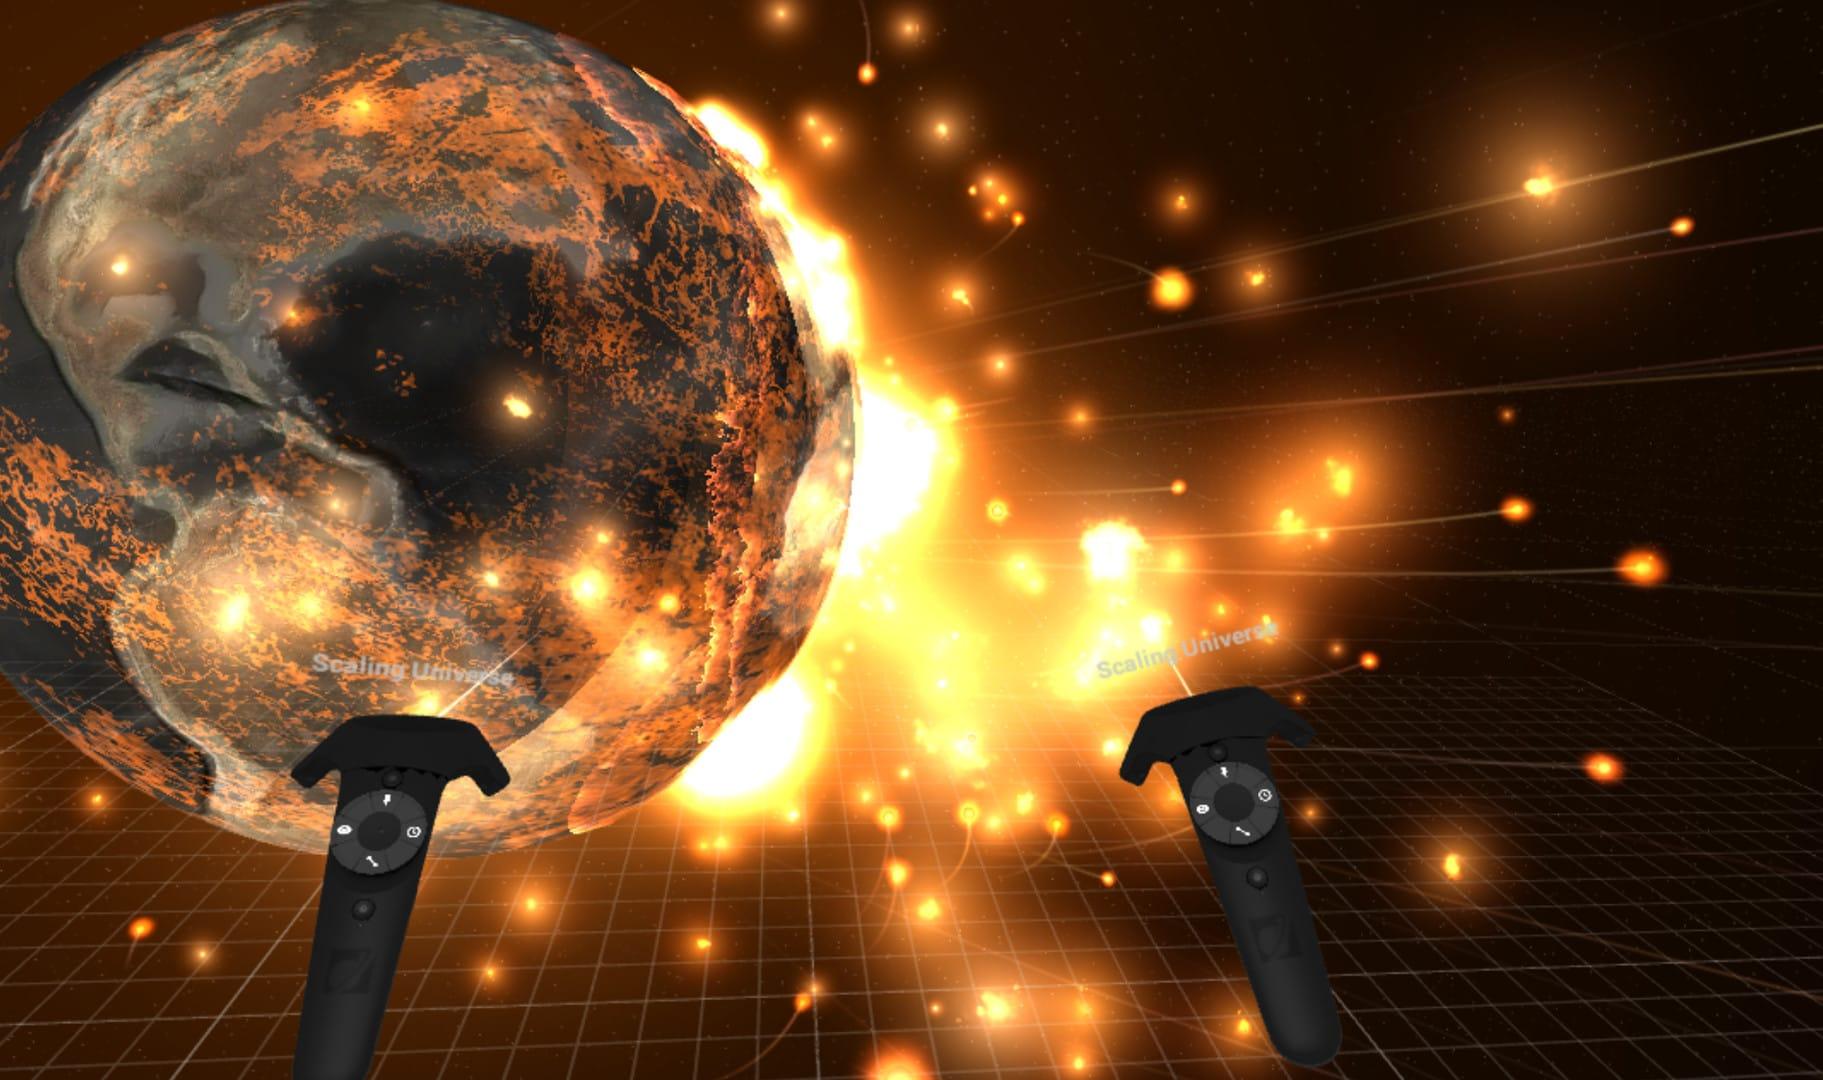 Universe Sandbox Steam Key GLOBAL - 3